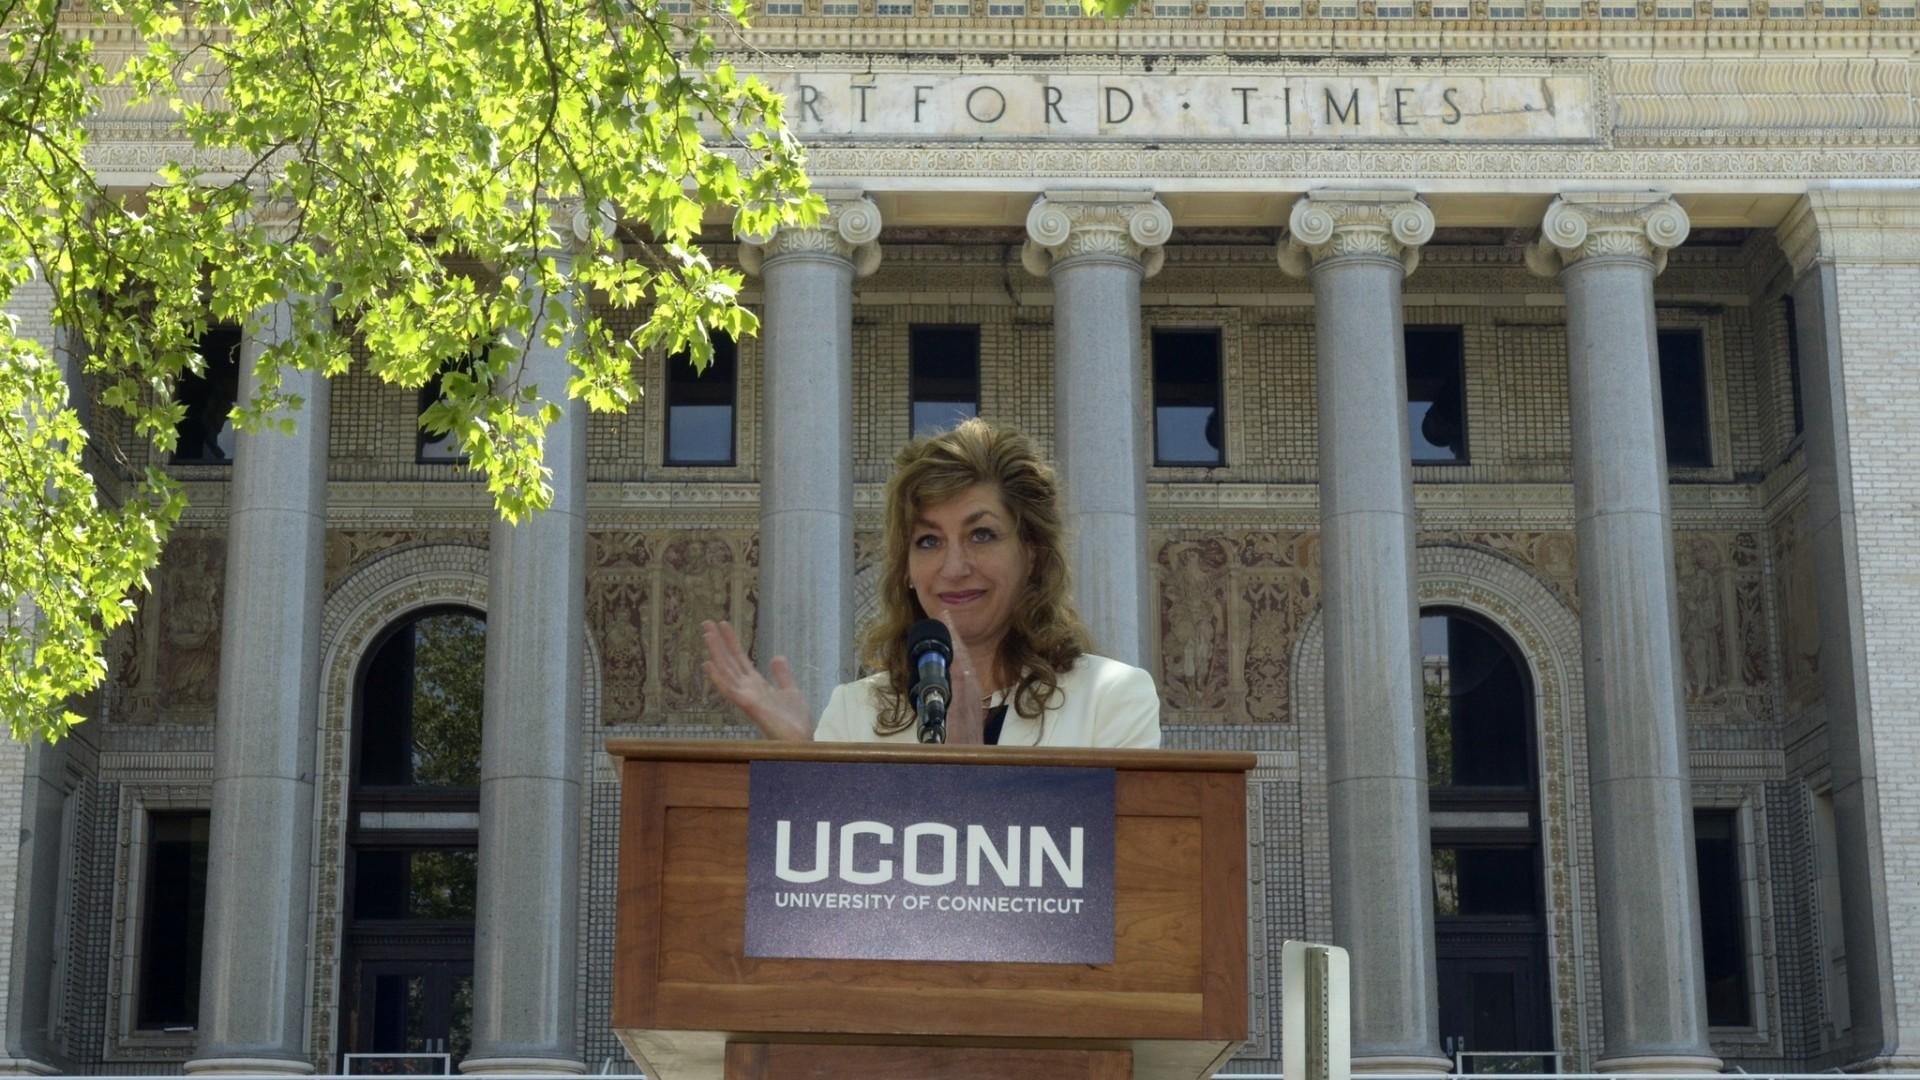 Uconn Symposium On Mental Health Hartford Courant